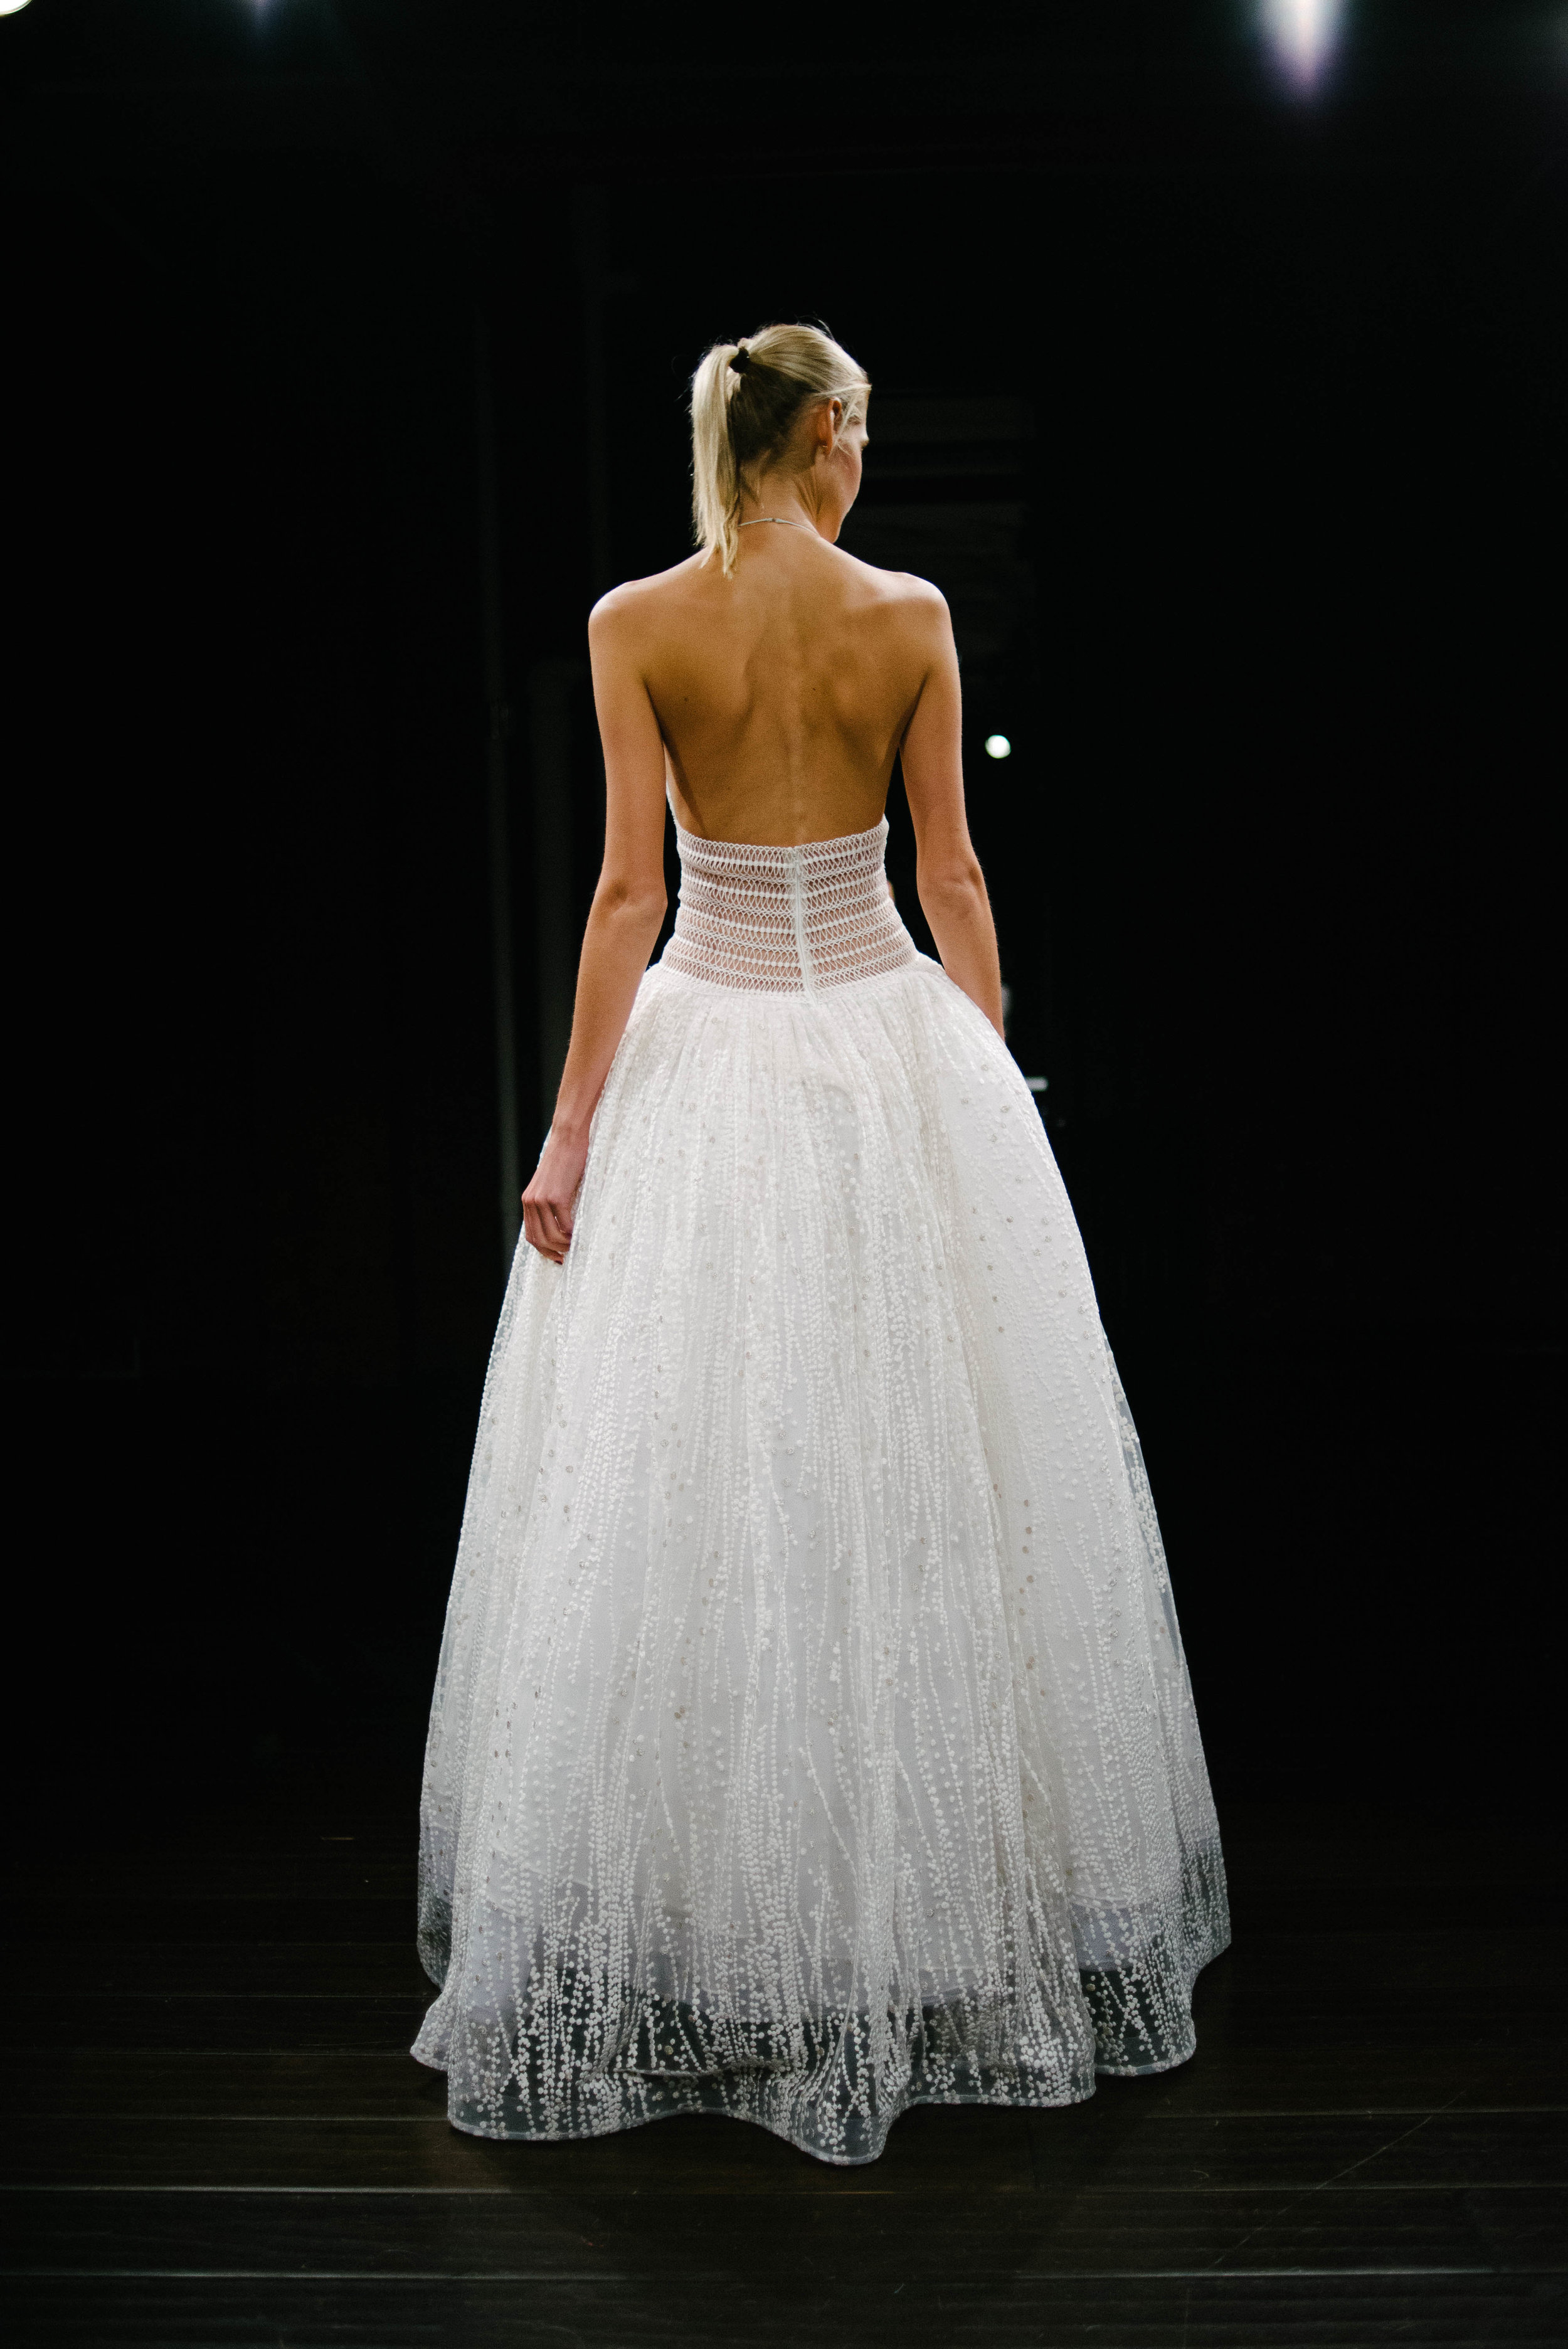 New York Bridal Fashion Week 2016 | Naeem Khan | Little White Dress Bridal Shop in Denver